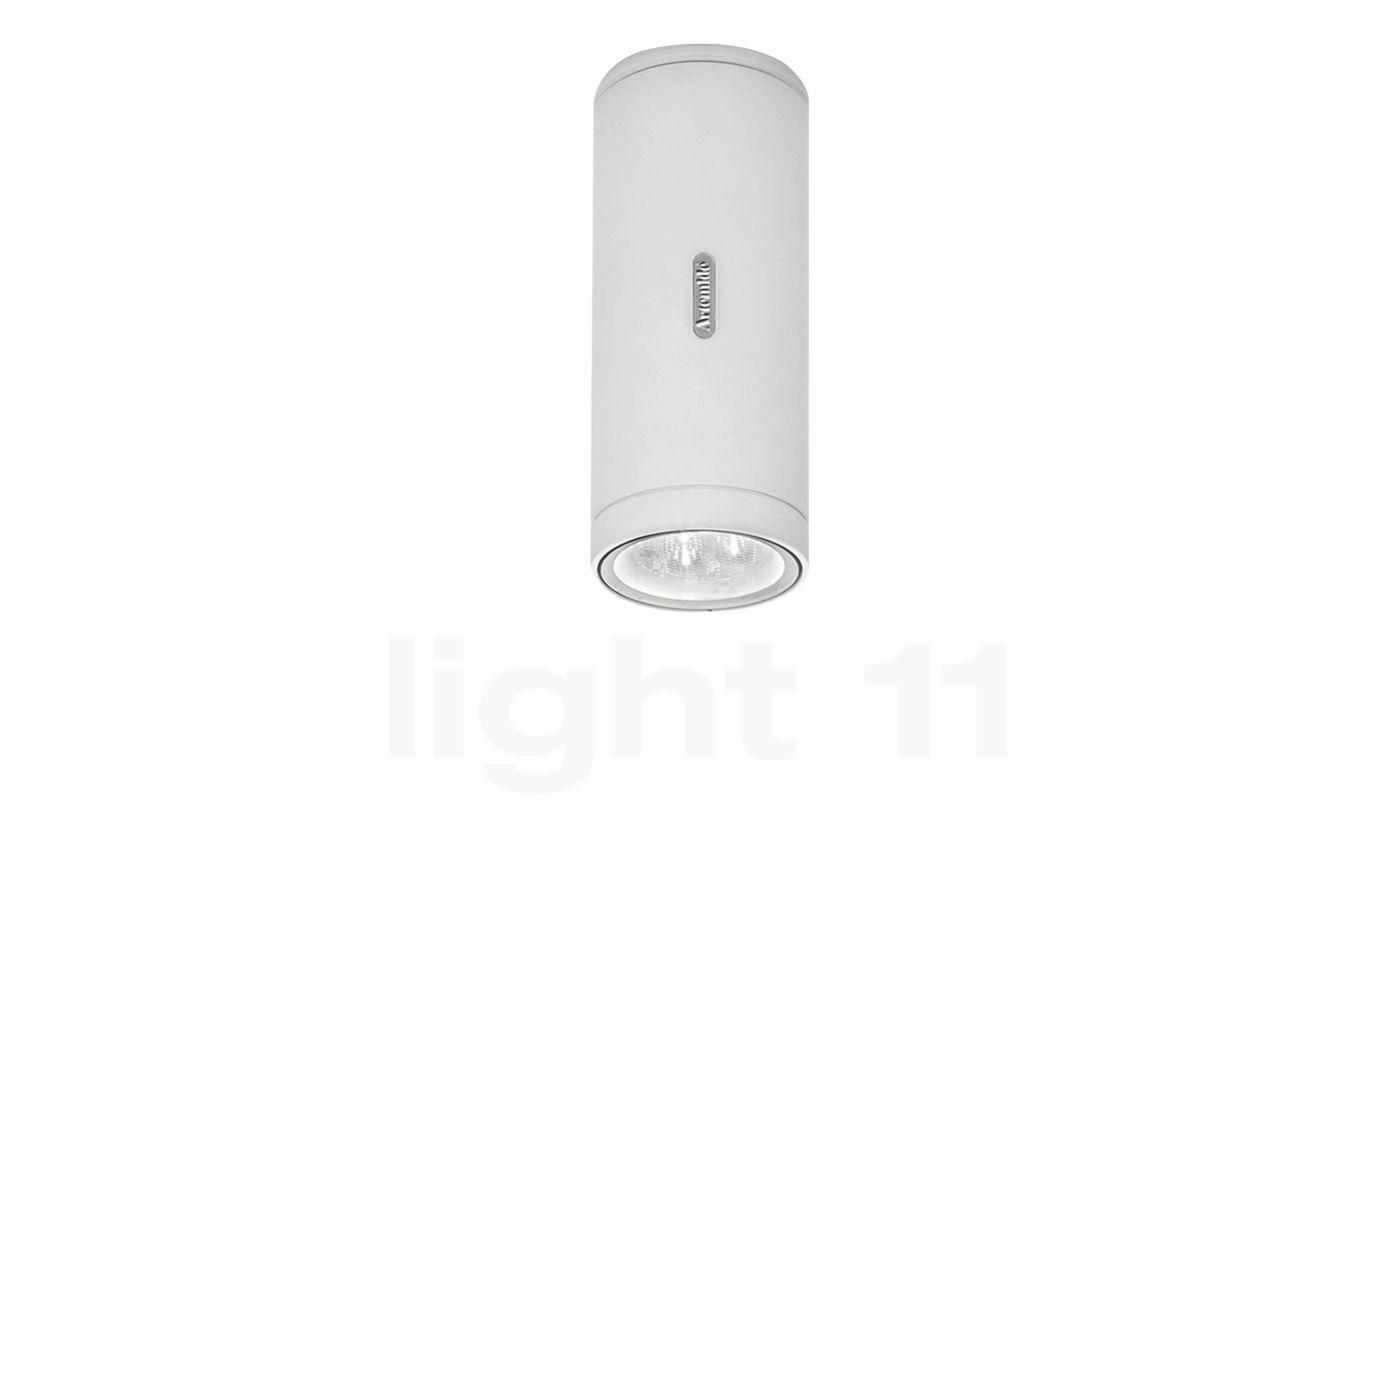 Artemide Calumet Deckenleuchte LED, weiß, 17,8 cm T41931LW00